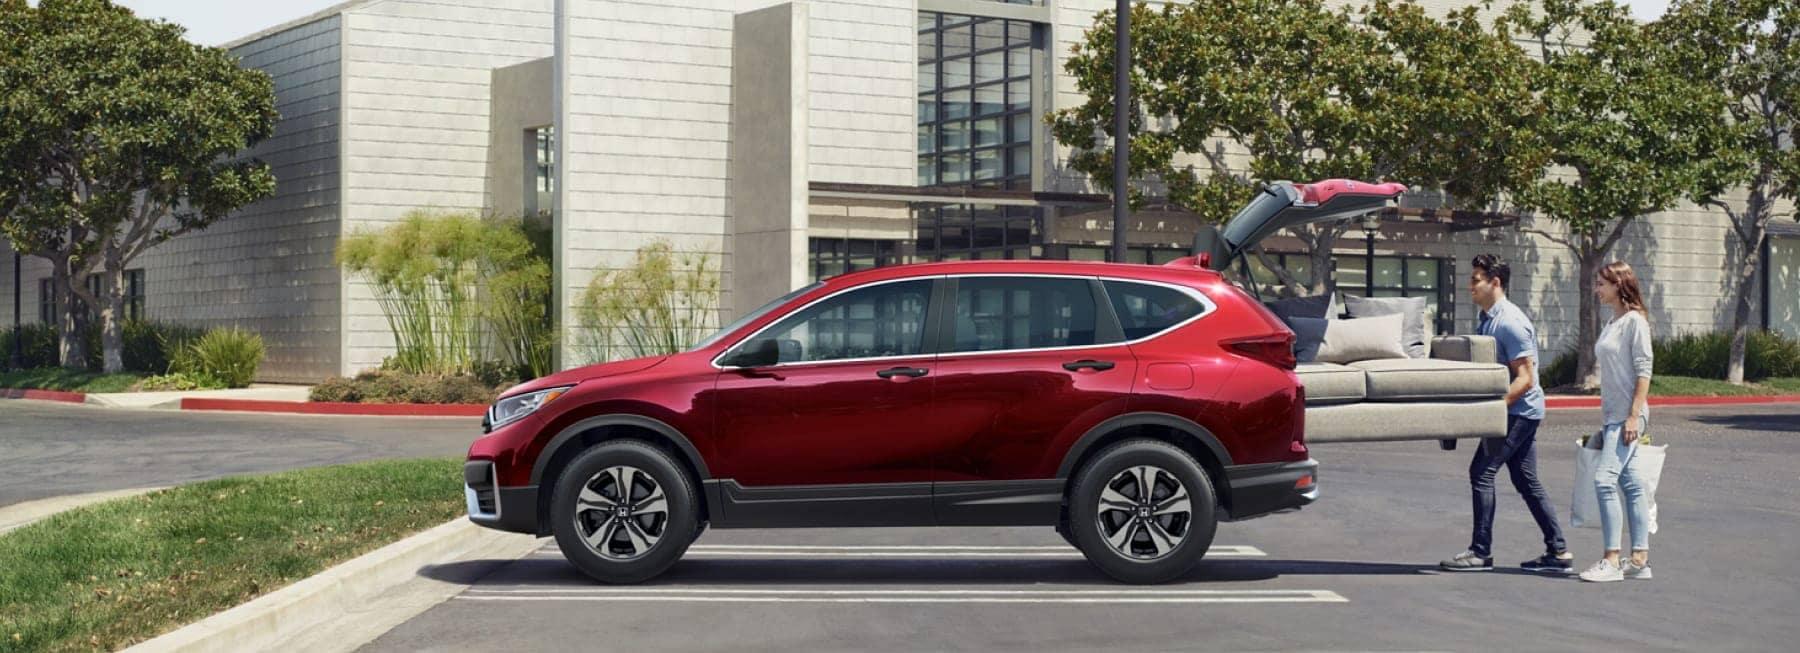 New Honda Dealership in Eugene, OR Selling Used Cars for Sale